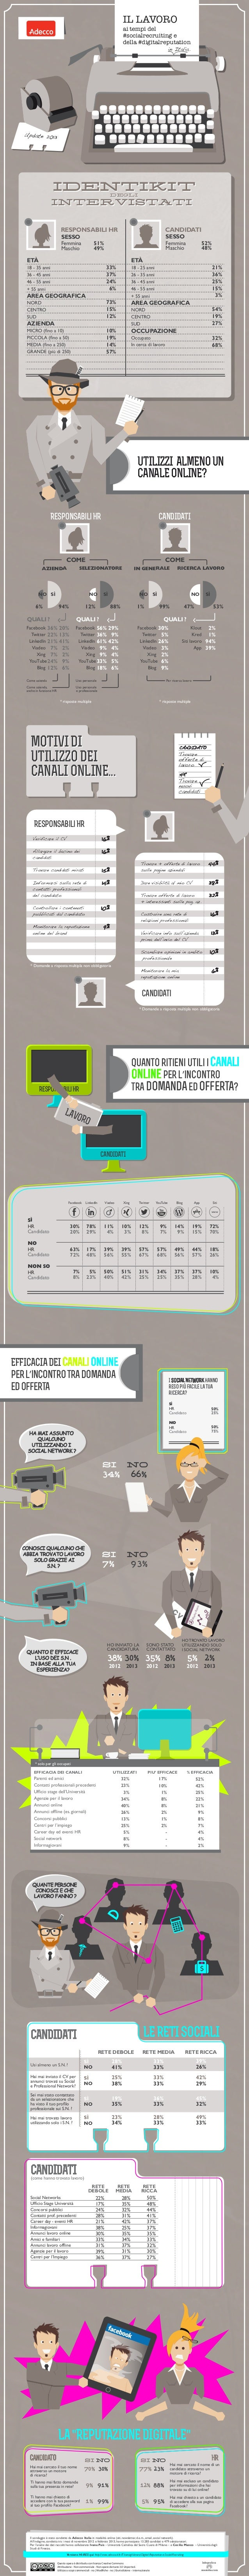 Digital Reputation e Social Recruiting - Indagine Adecco 2013